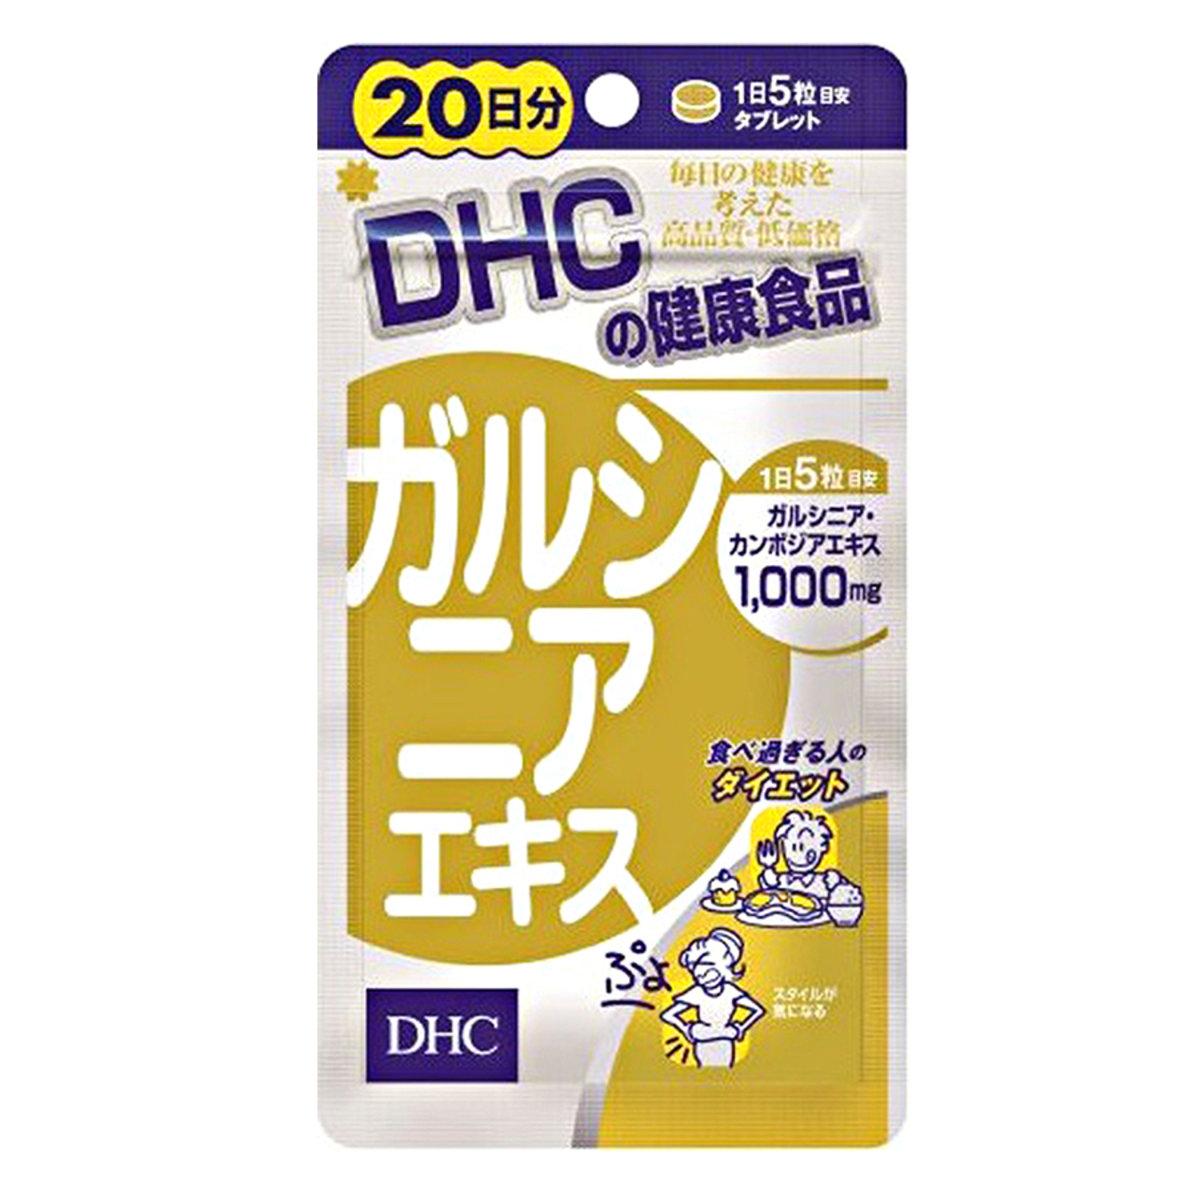 DHC藤黃果精華瘦腰腩丸 20日份 (平行進口)